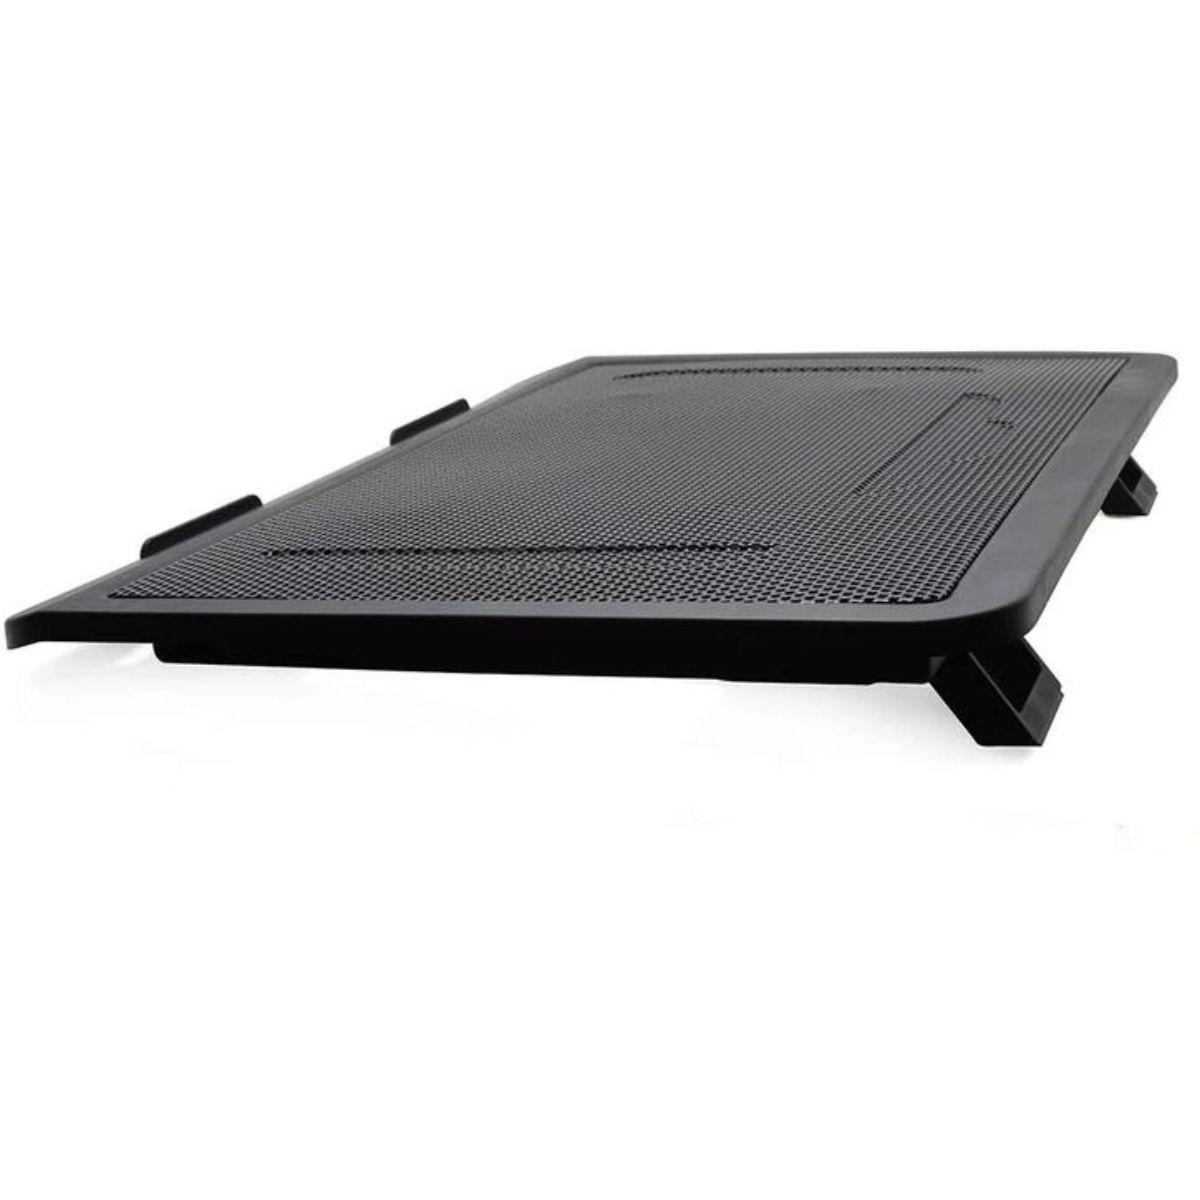 almohadilla de refrigeracion para ordenador portatil 4 1 1